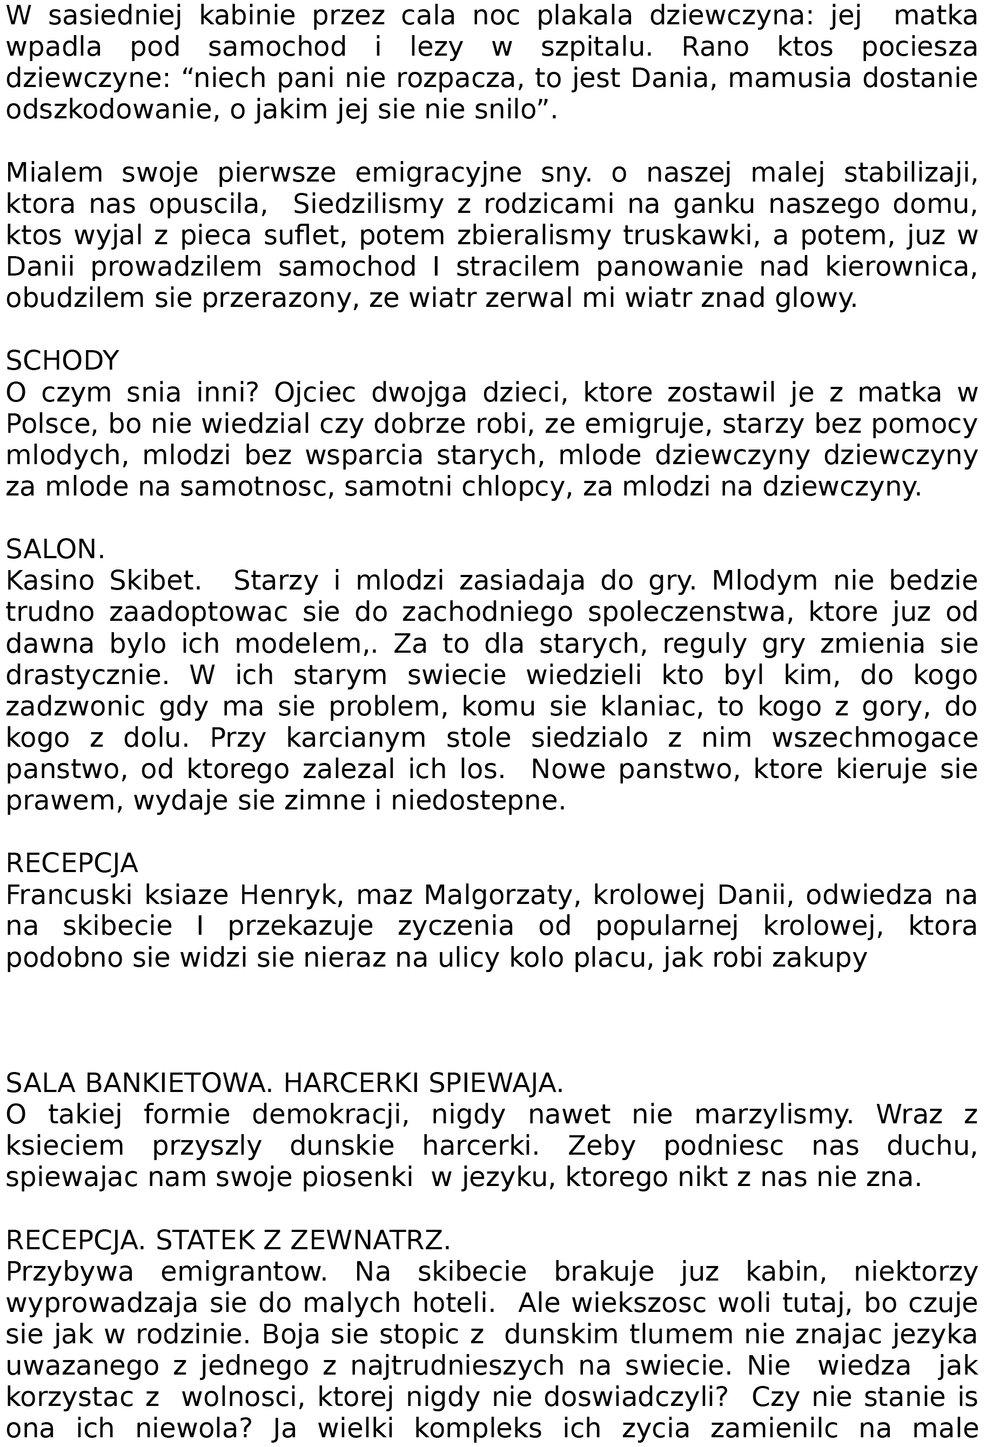 SKIBET-WERSJA-POLSKA-9.jpg